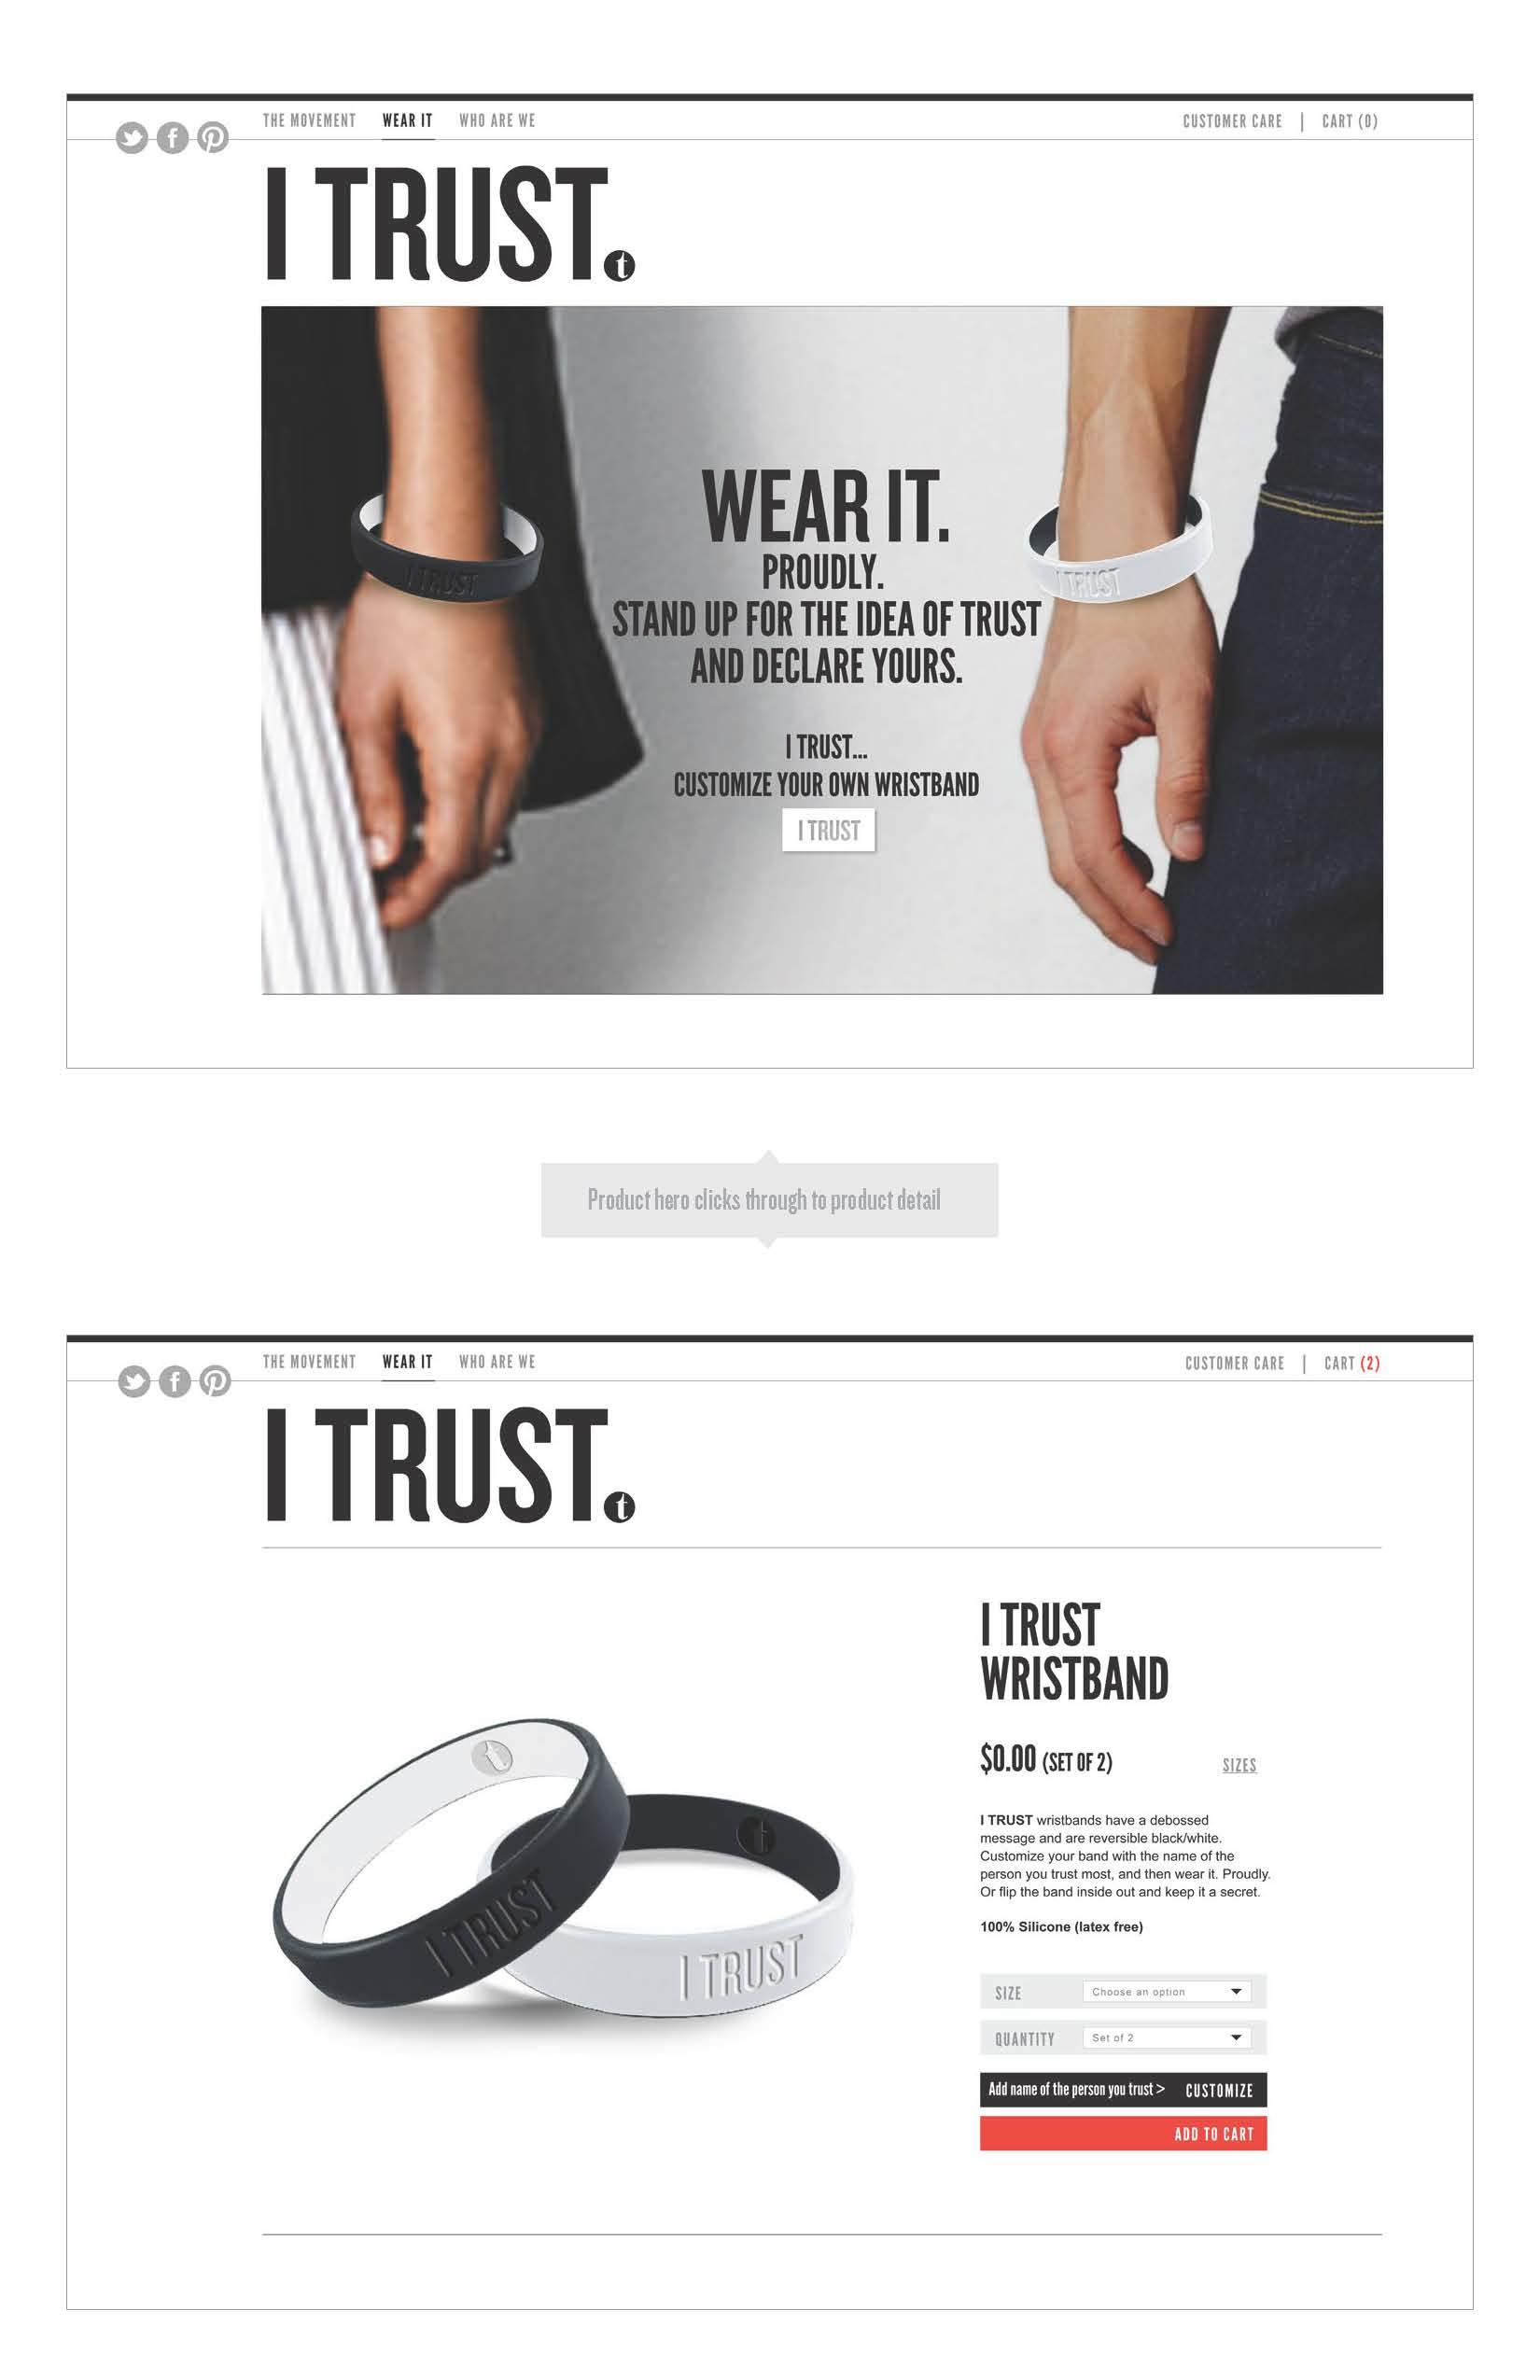 I_Trust_1027_Page_09.jpg